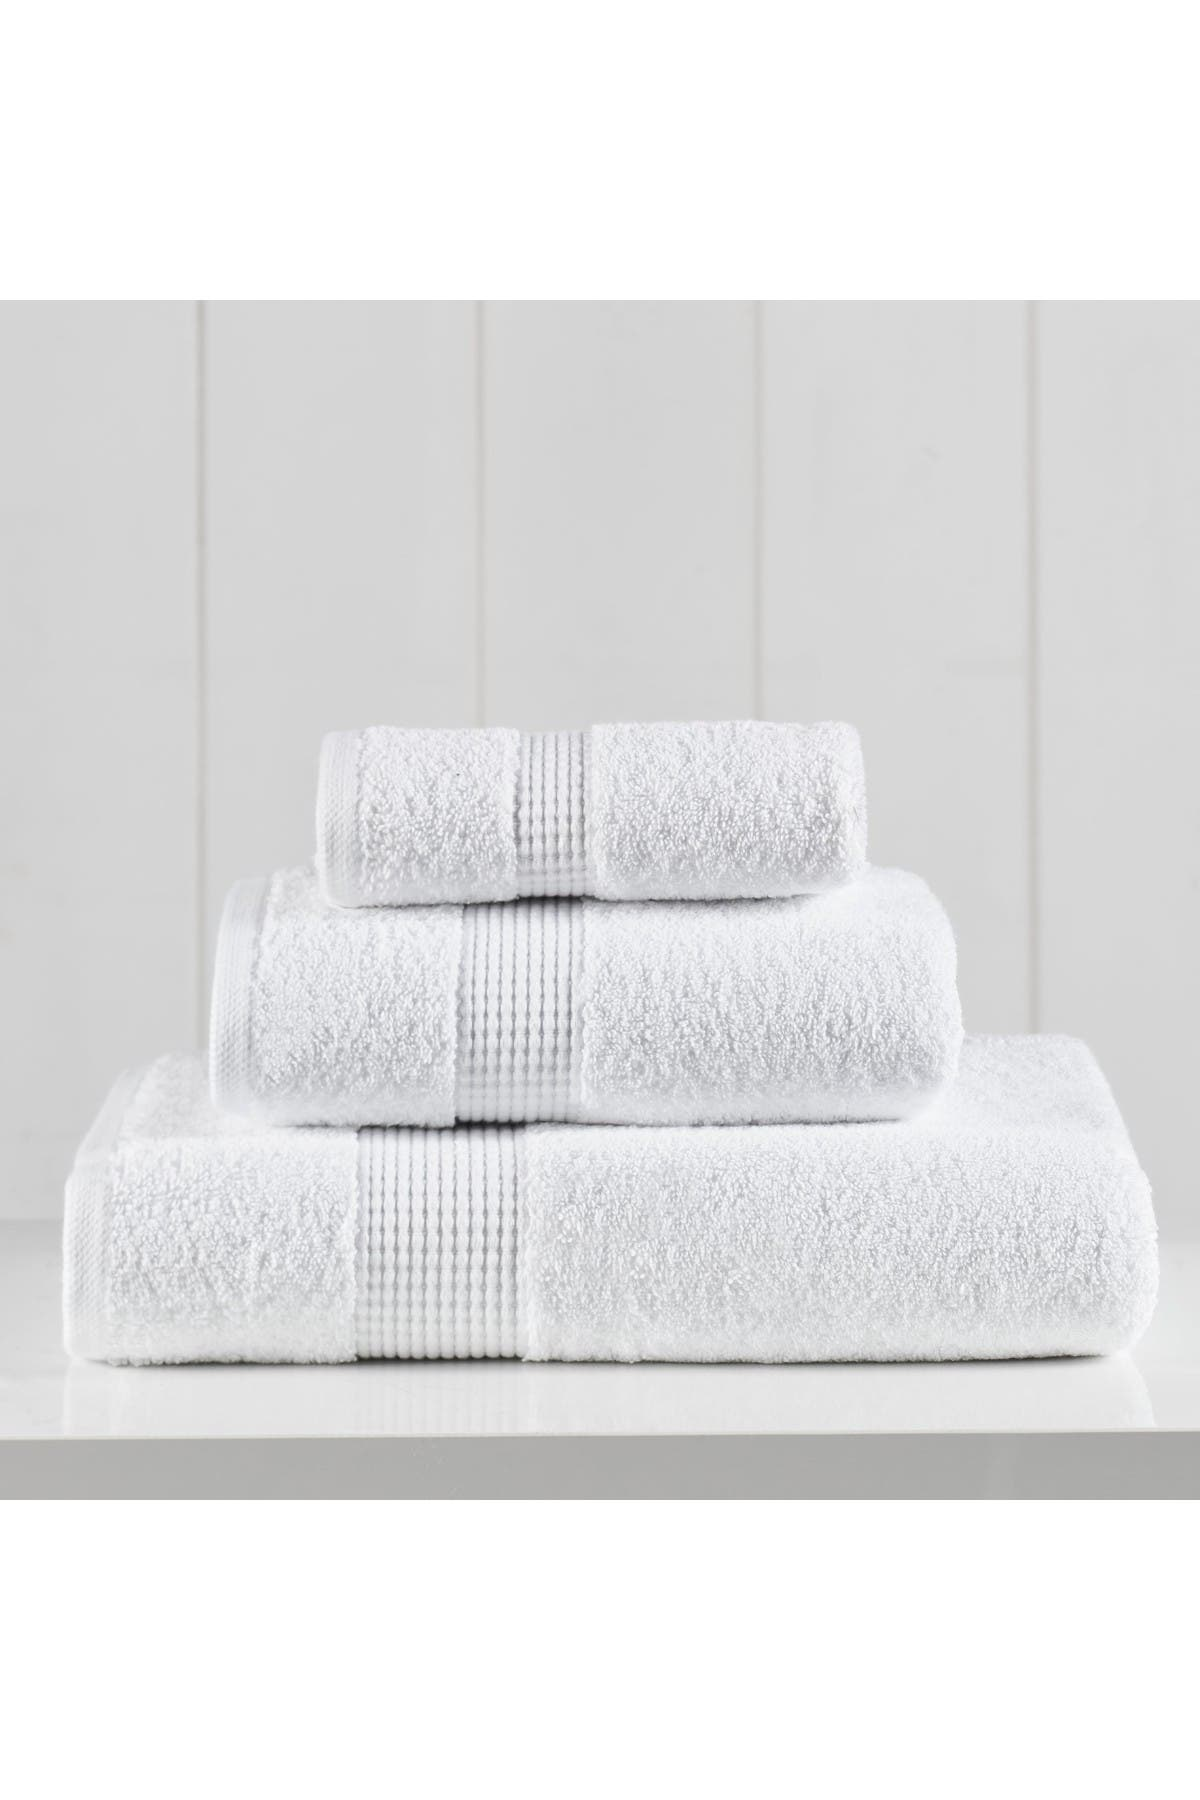 Image of Modern Threads Manor Ridge Turkish Cotton 3-Piece Towel Set - White